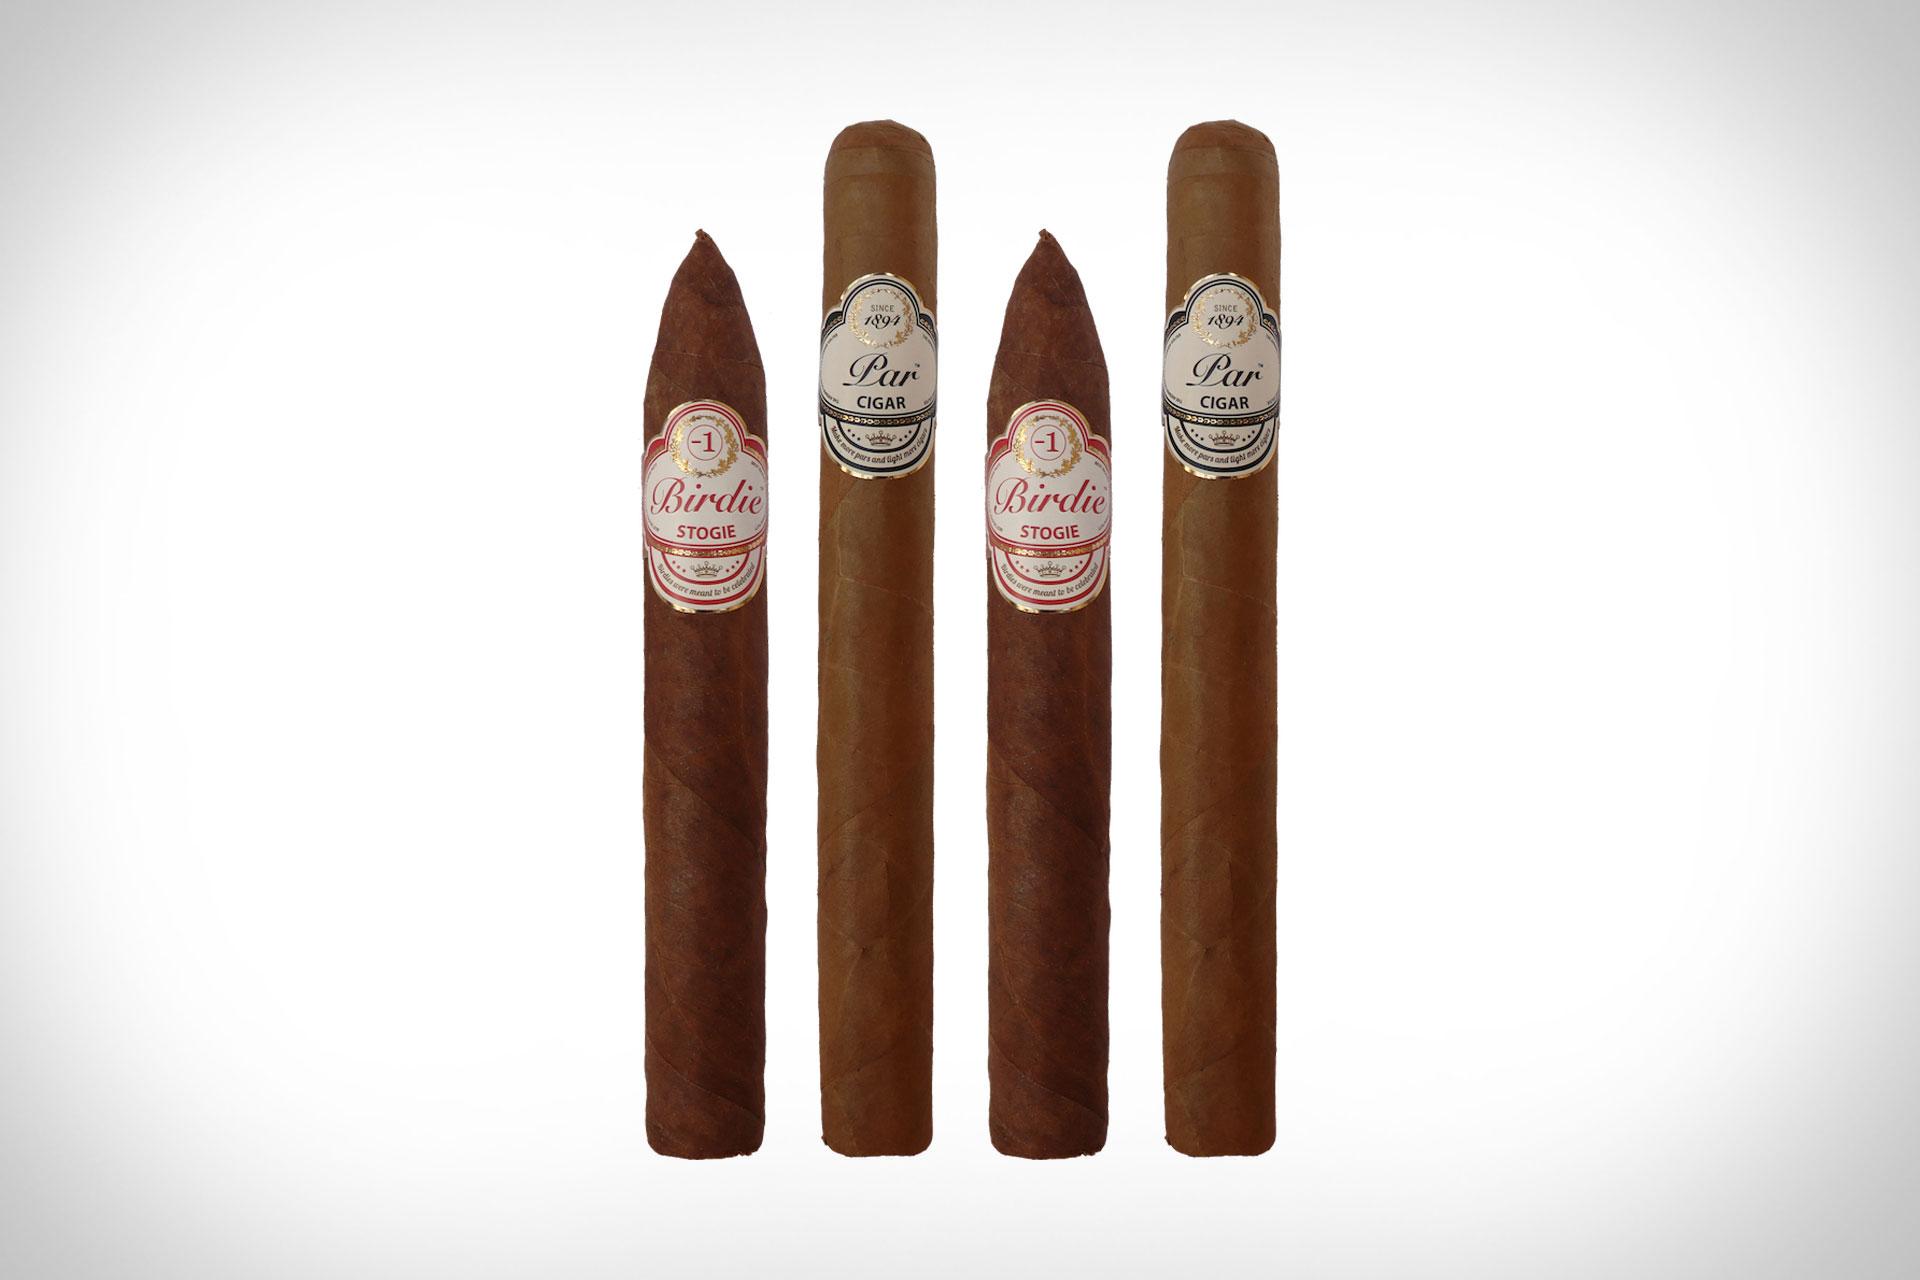 Greenside Cigars